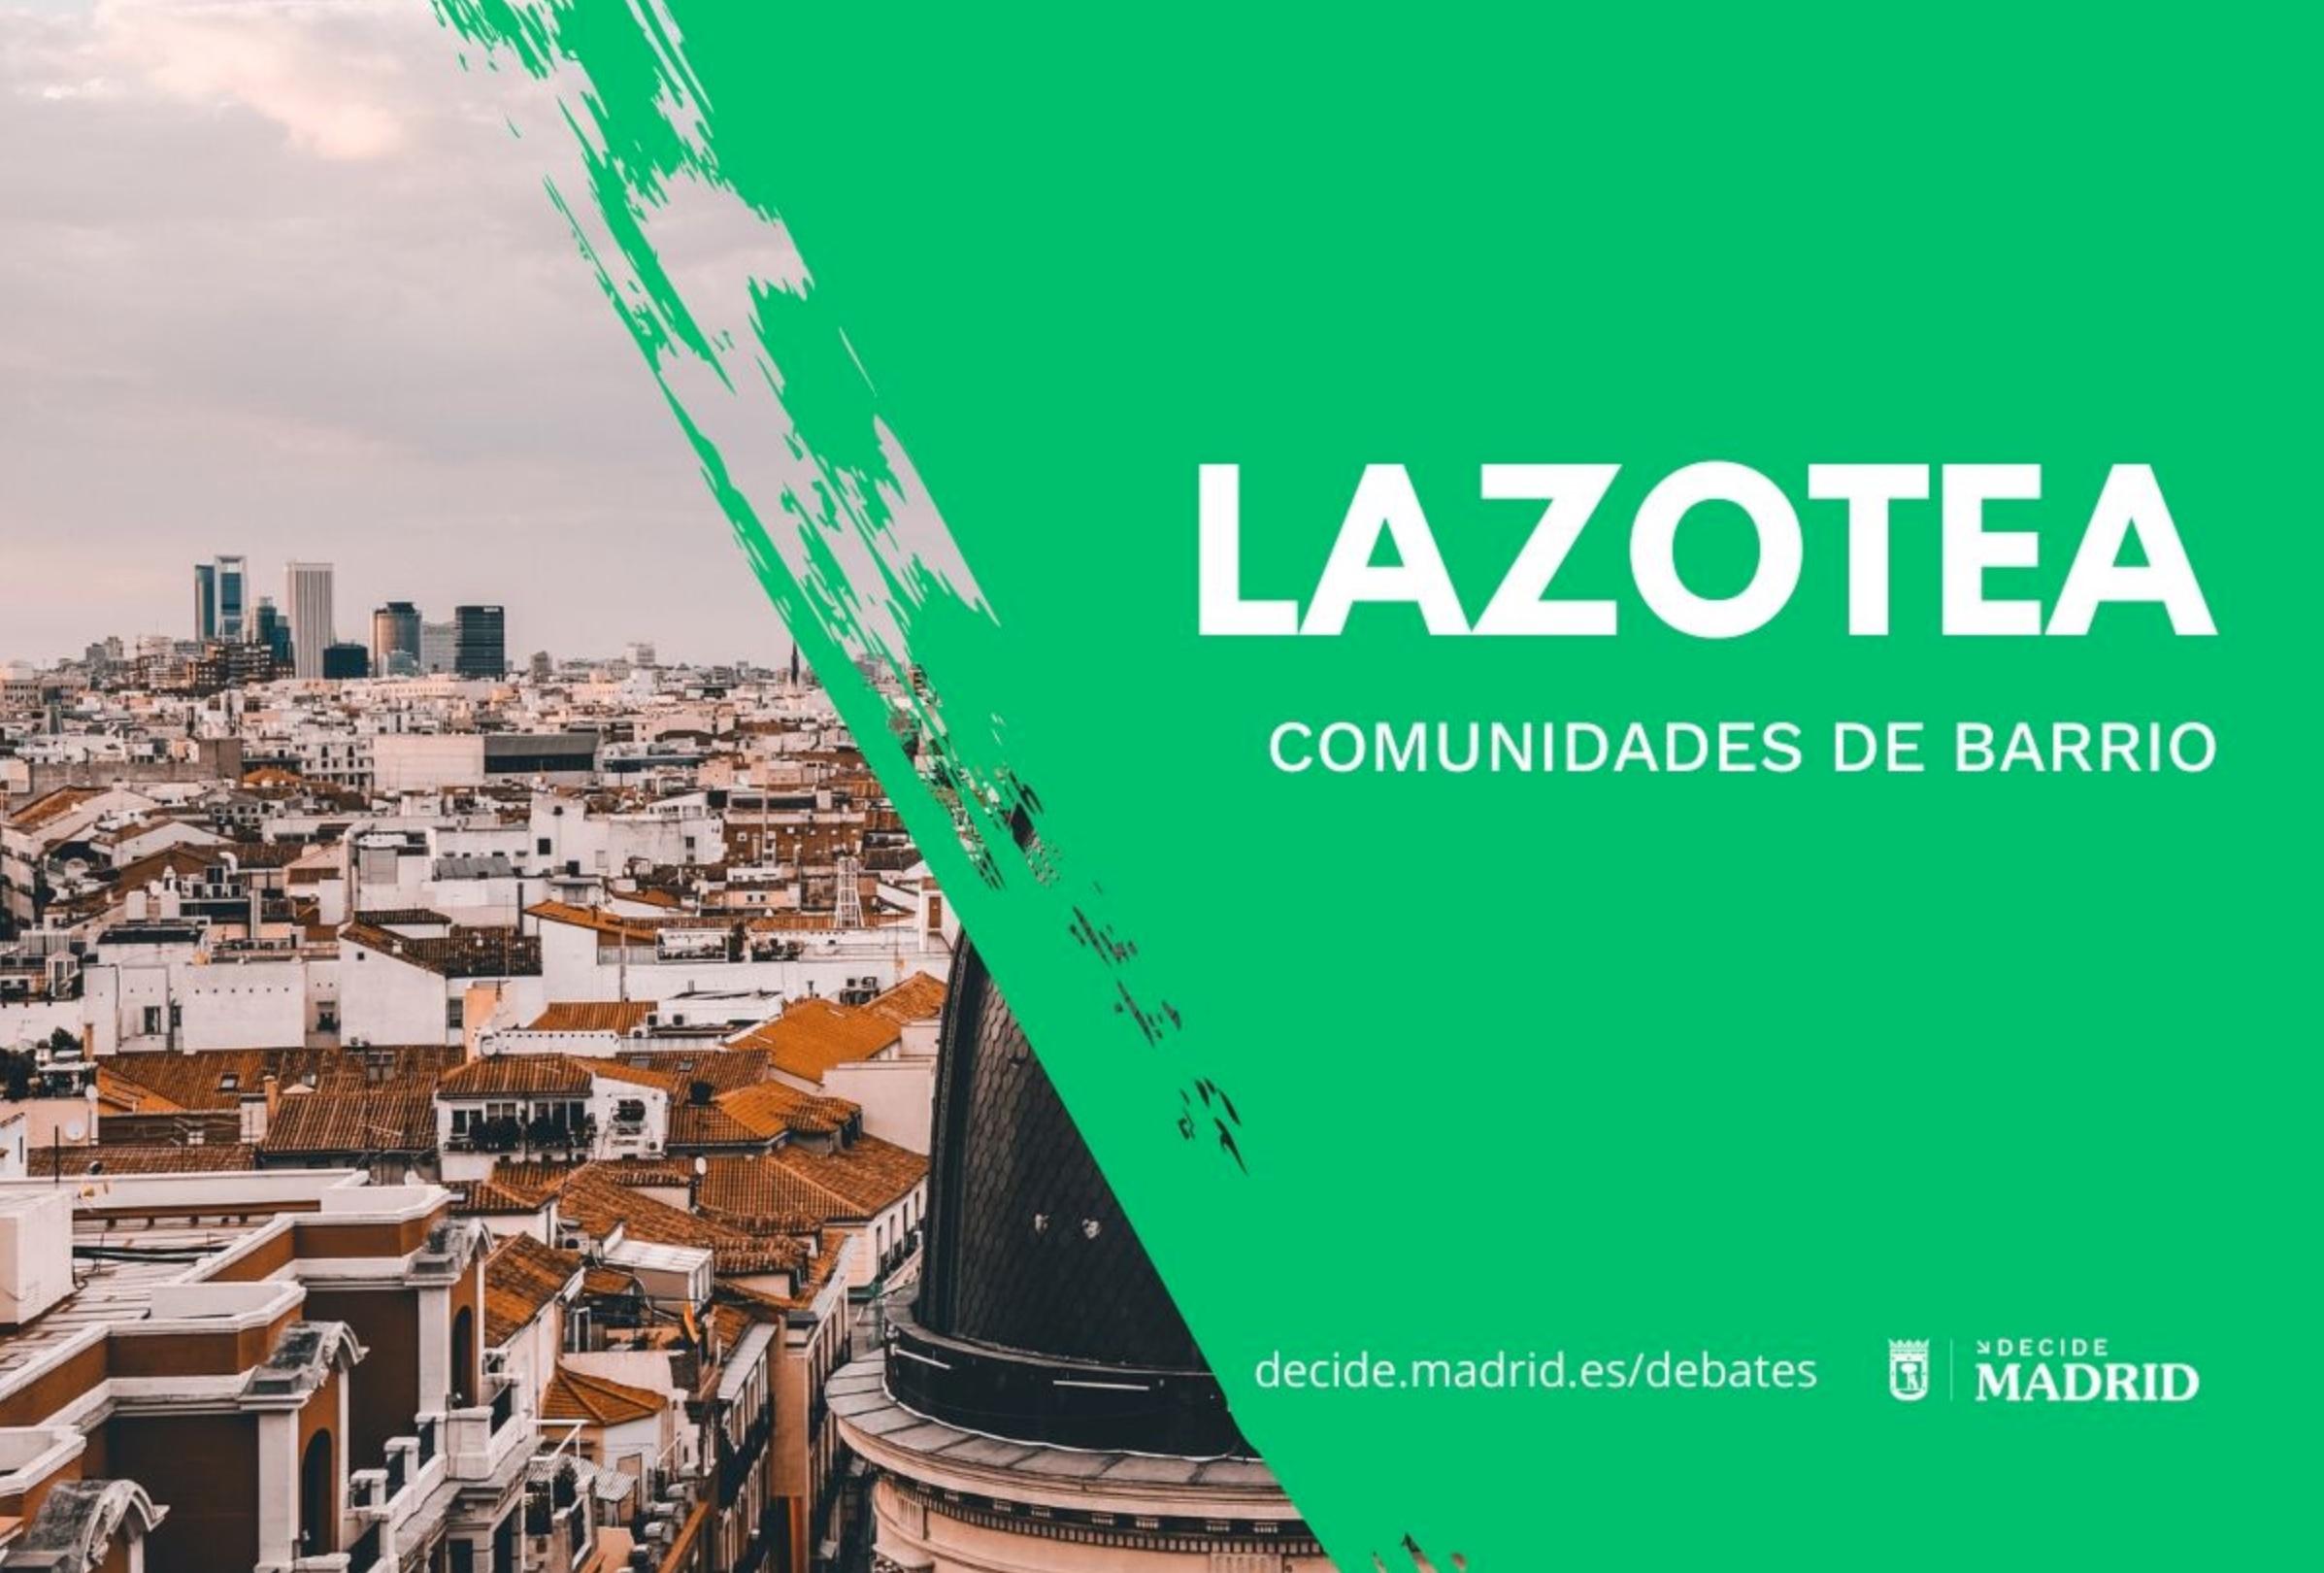 foro online; LAZOTEA